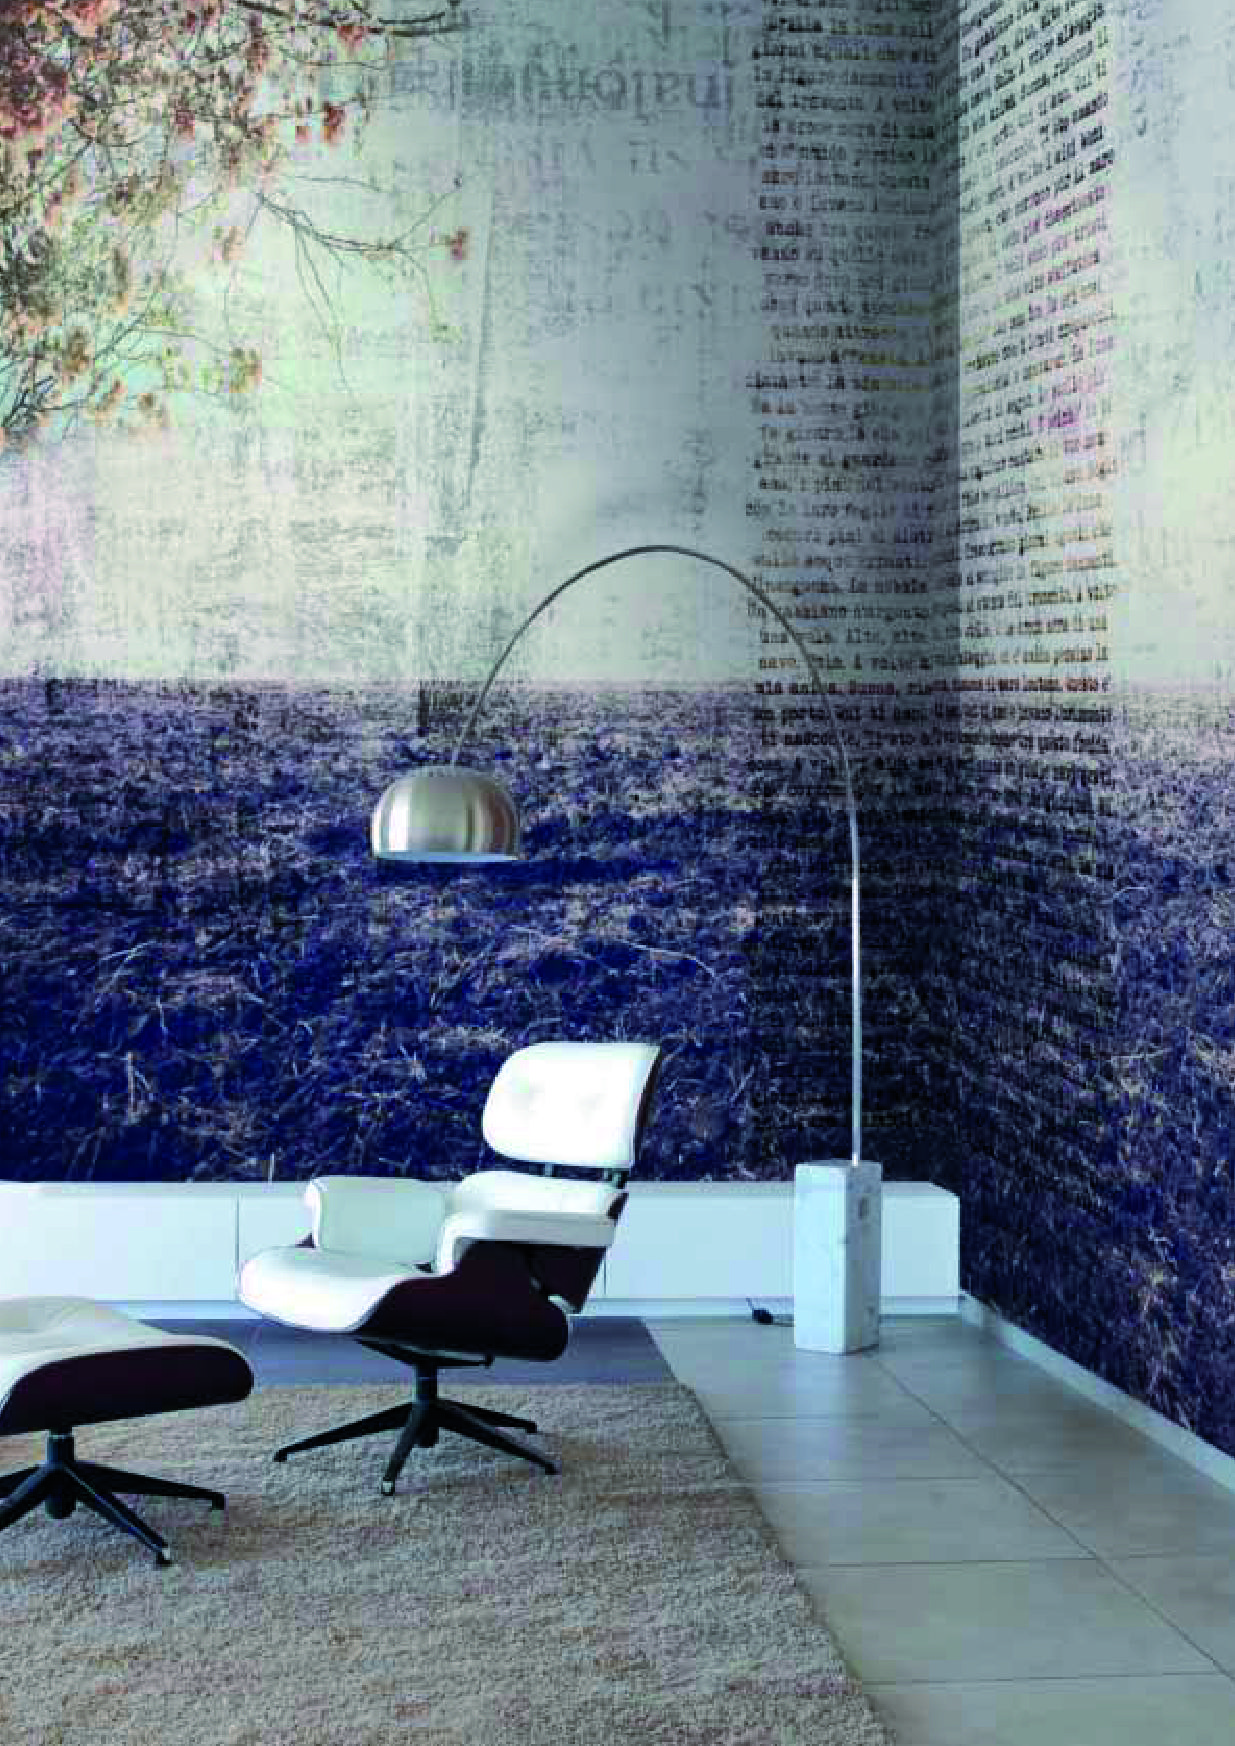 Wallpaper Art - Carta da Parati firmata Adriani e Rossi per Prime ...